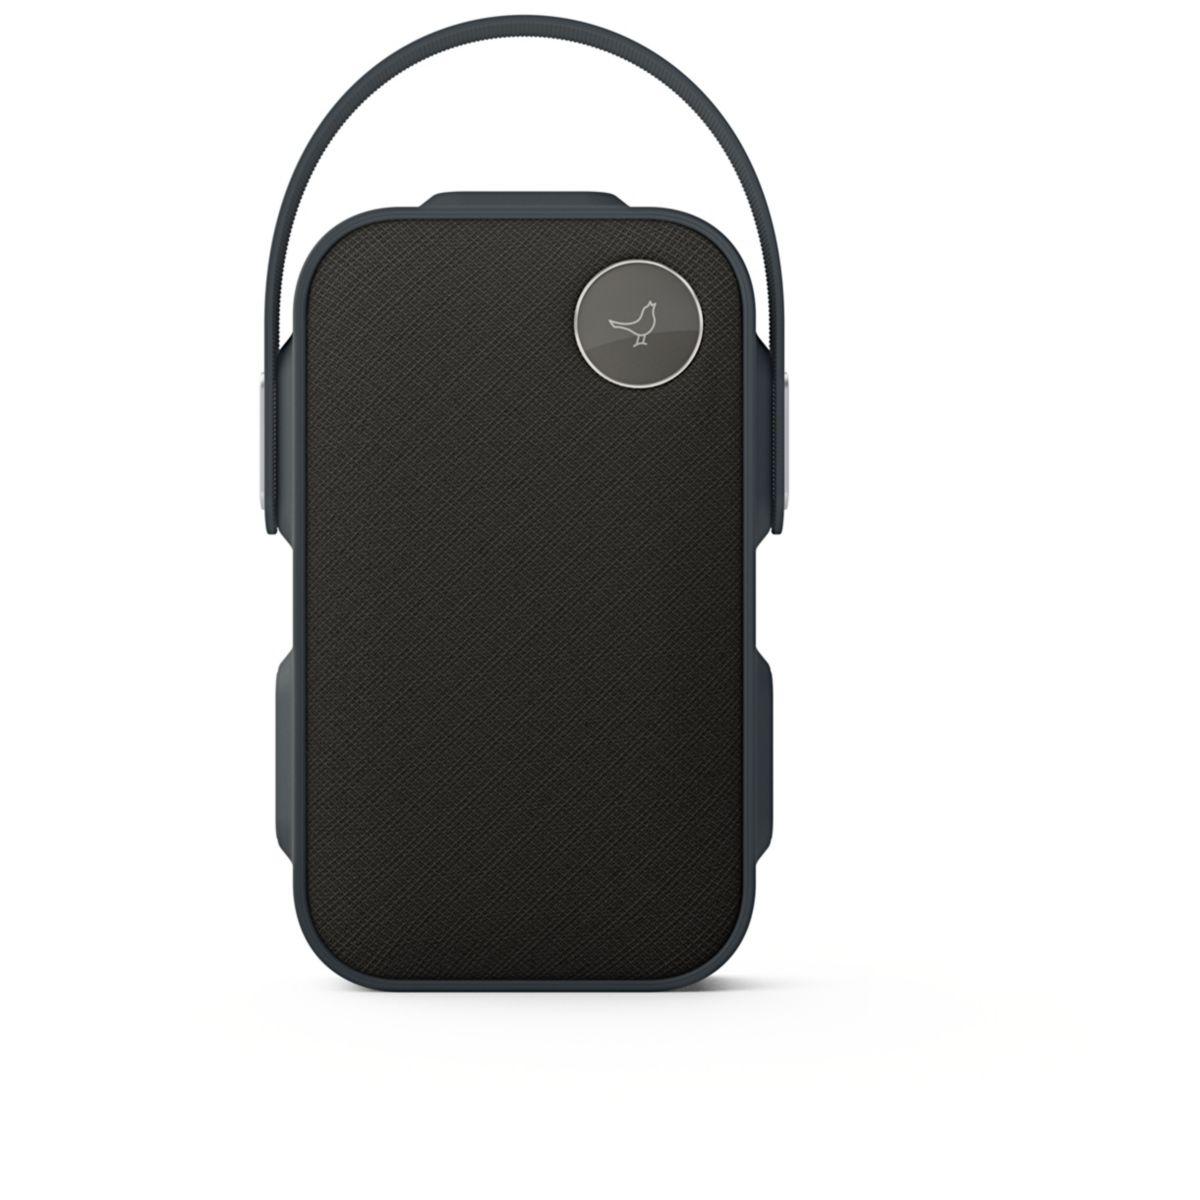 Enceinte Bluetooth LIBRATONE ONE click Gris Graphite